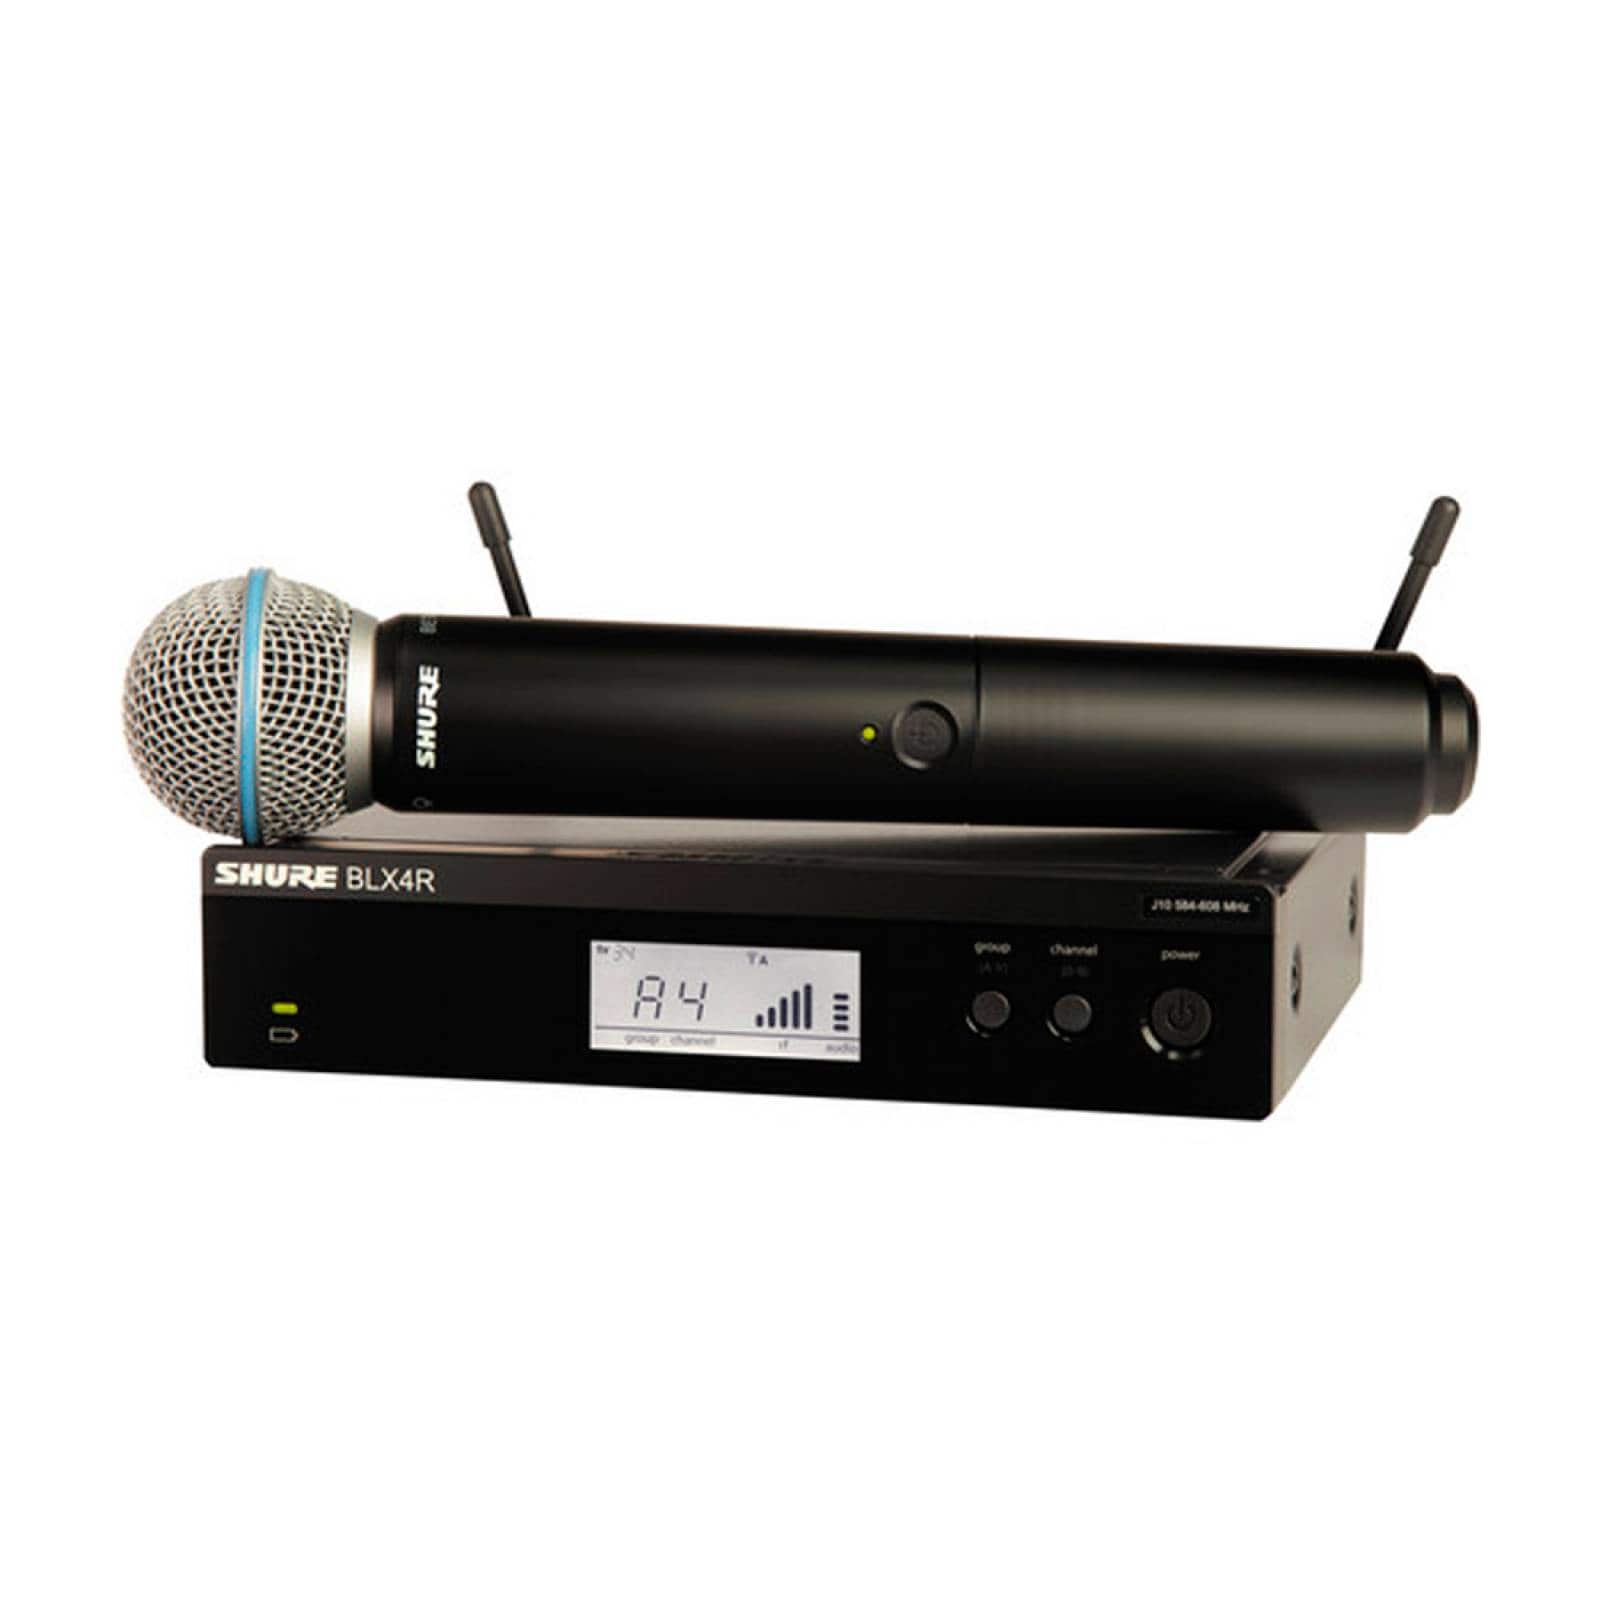 Micrófono Inalámbrico Receptor UHF 24MHz BLX24/B58 Shure